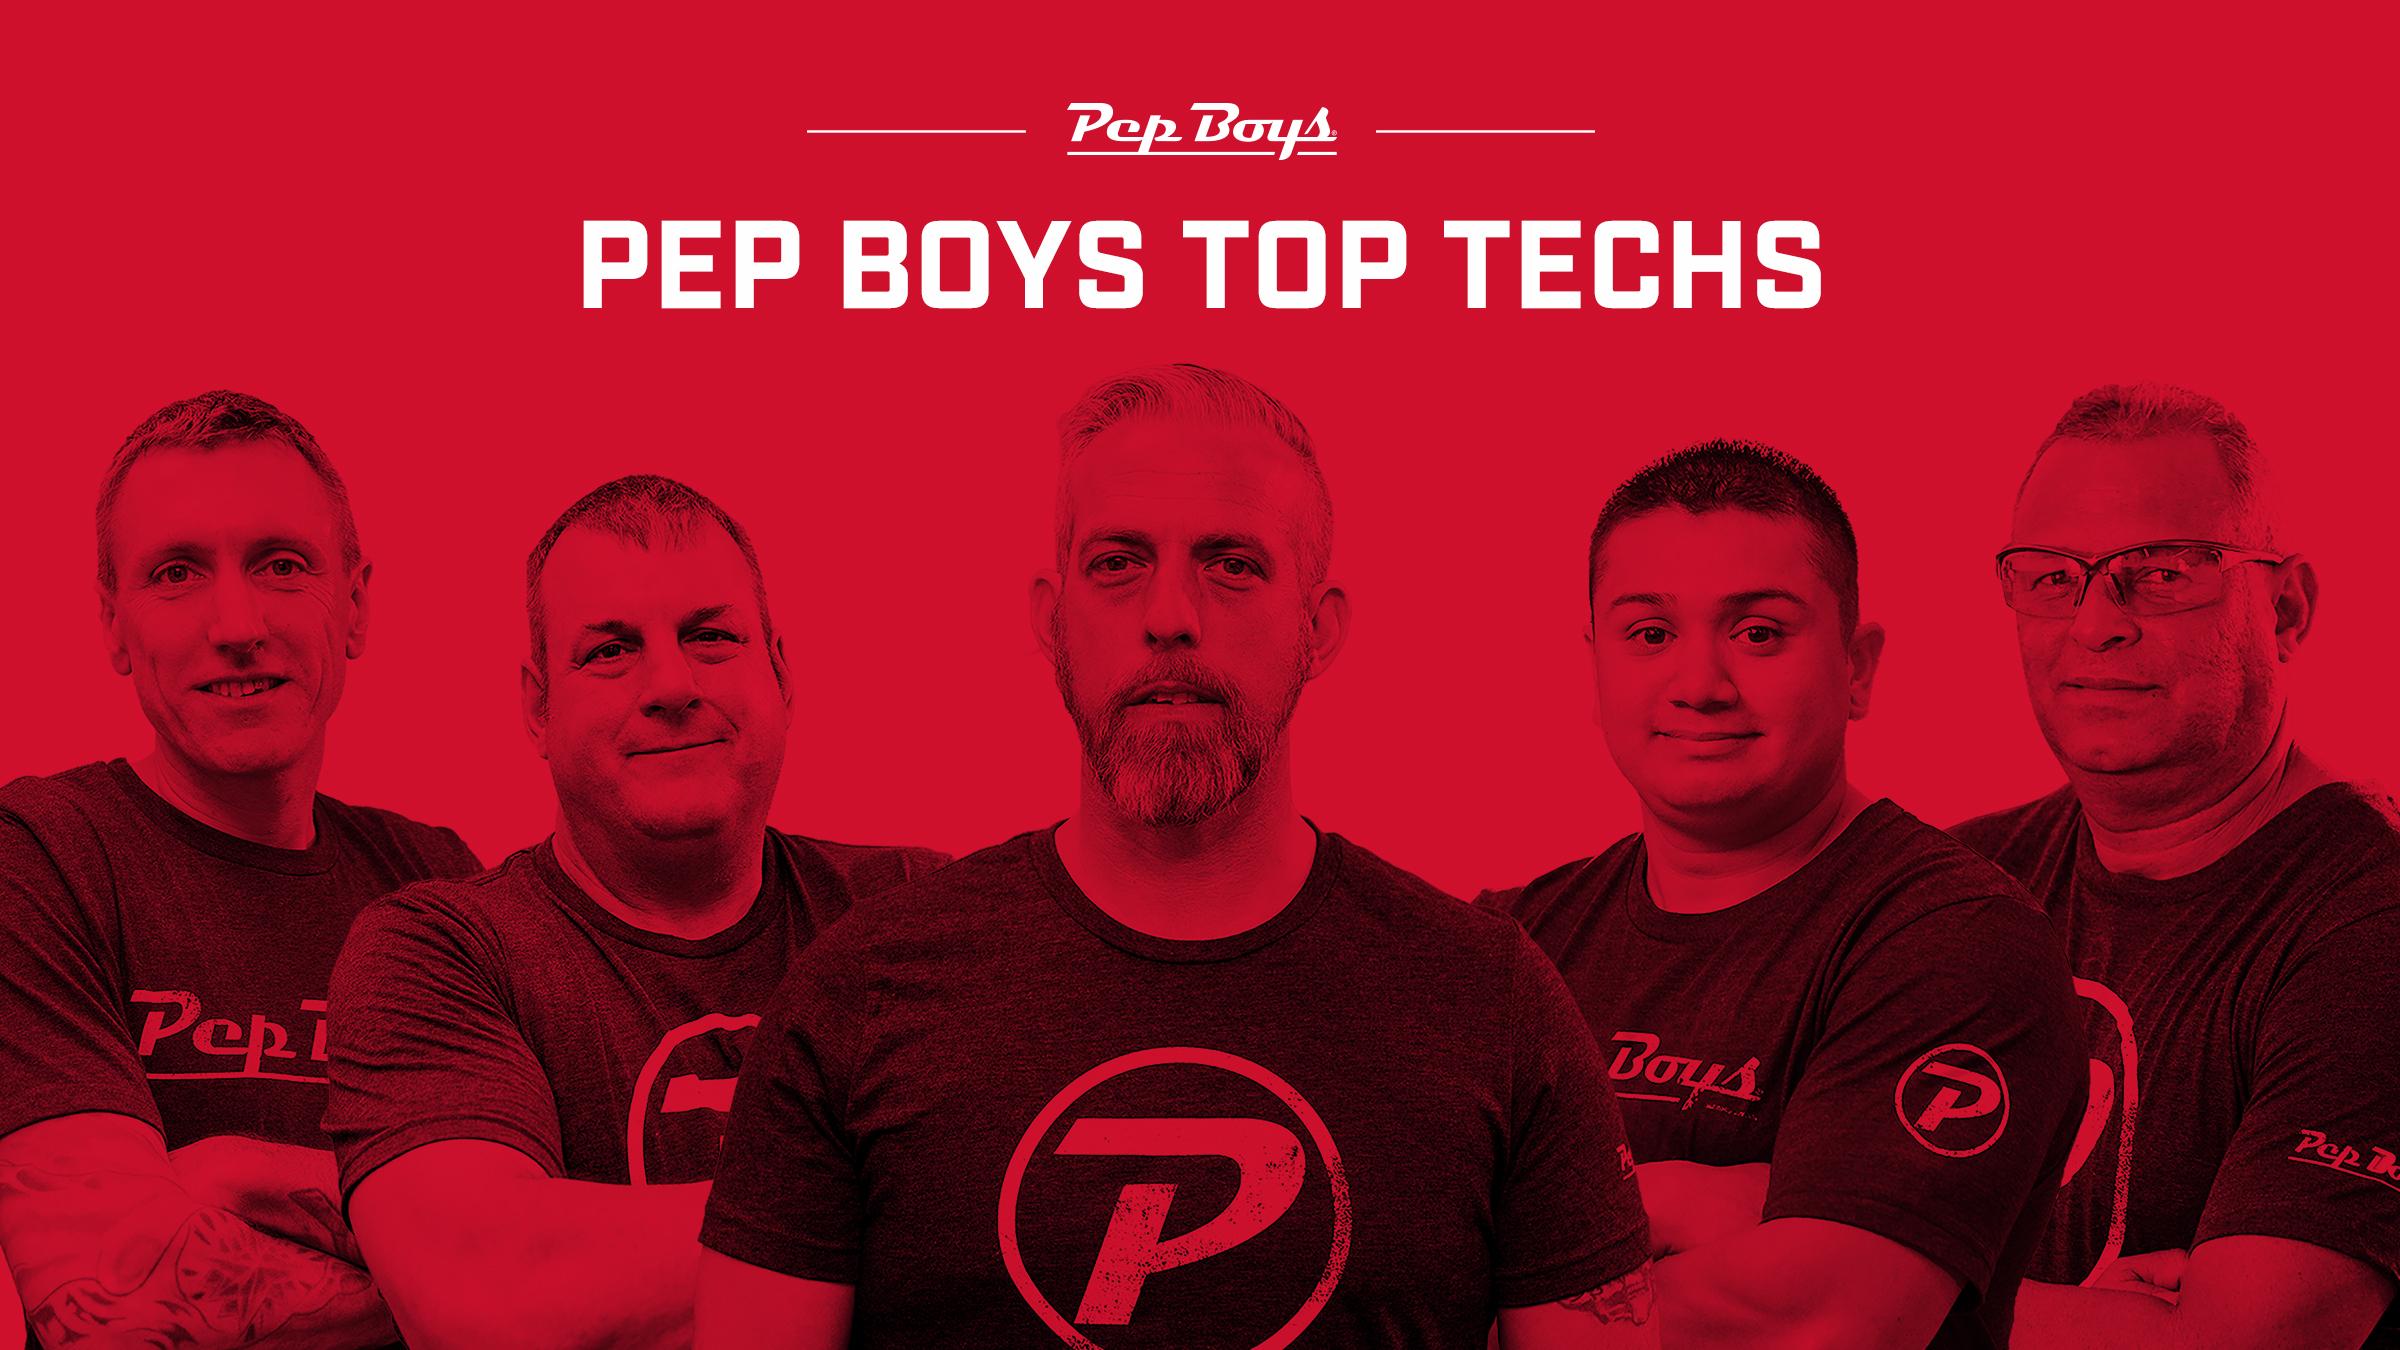 Pep Boys Announces 'Top Techs' Winners